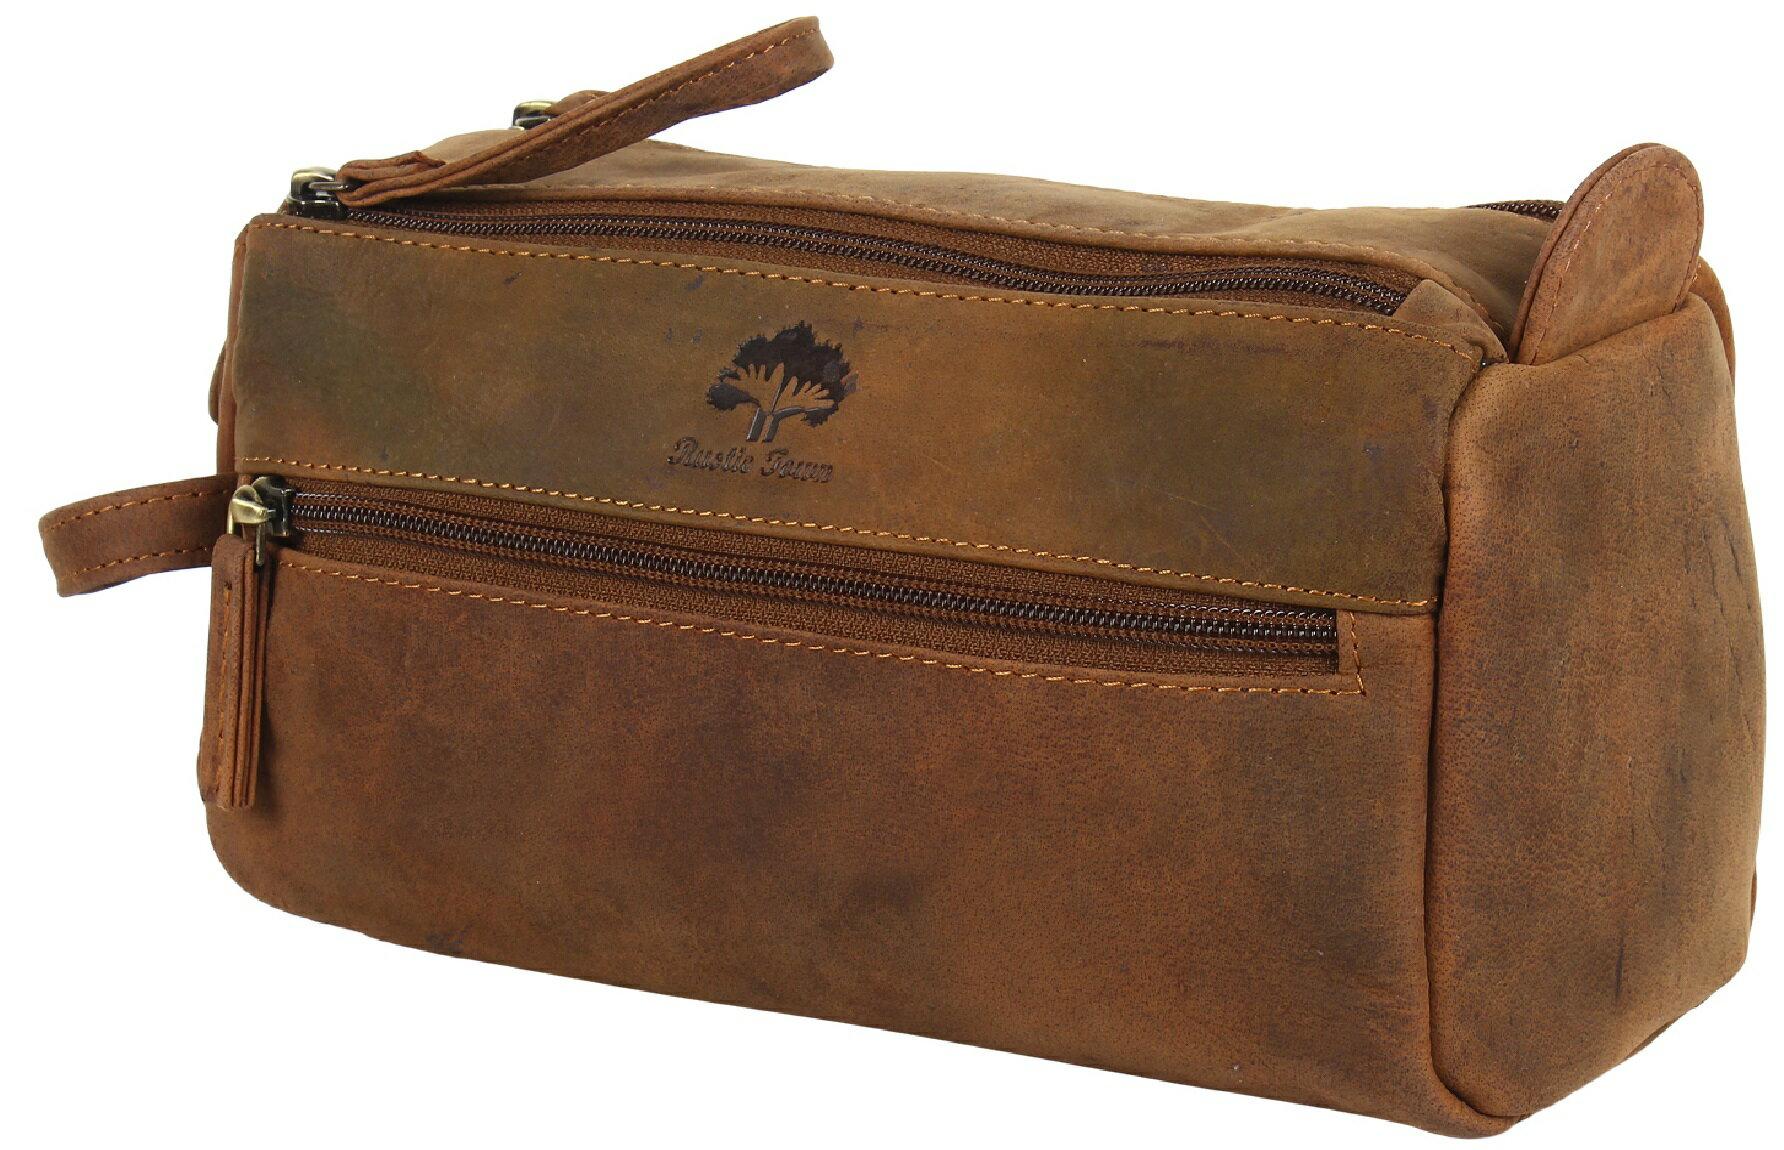 Genuine Leather Travel Toiletry Bag - Hygiene Organizer Dopp Kit By Rustic  Town (Brown) 74f3de5500